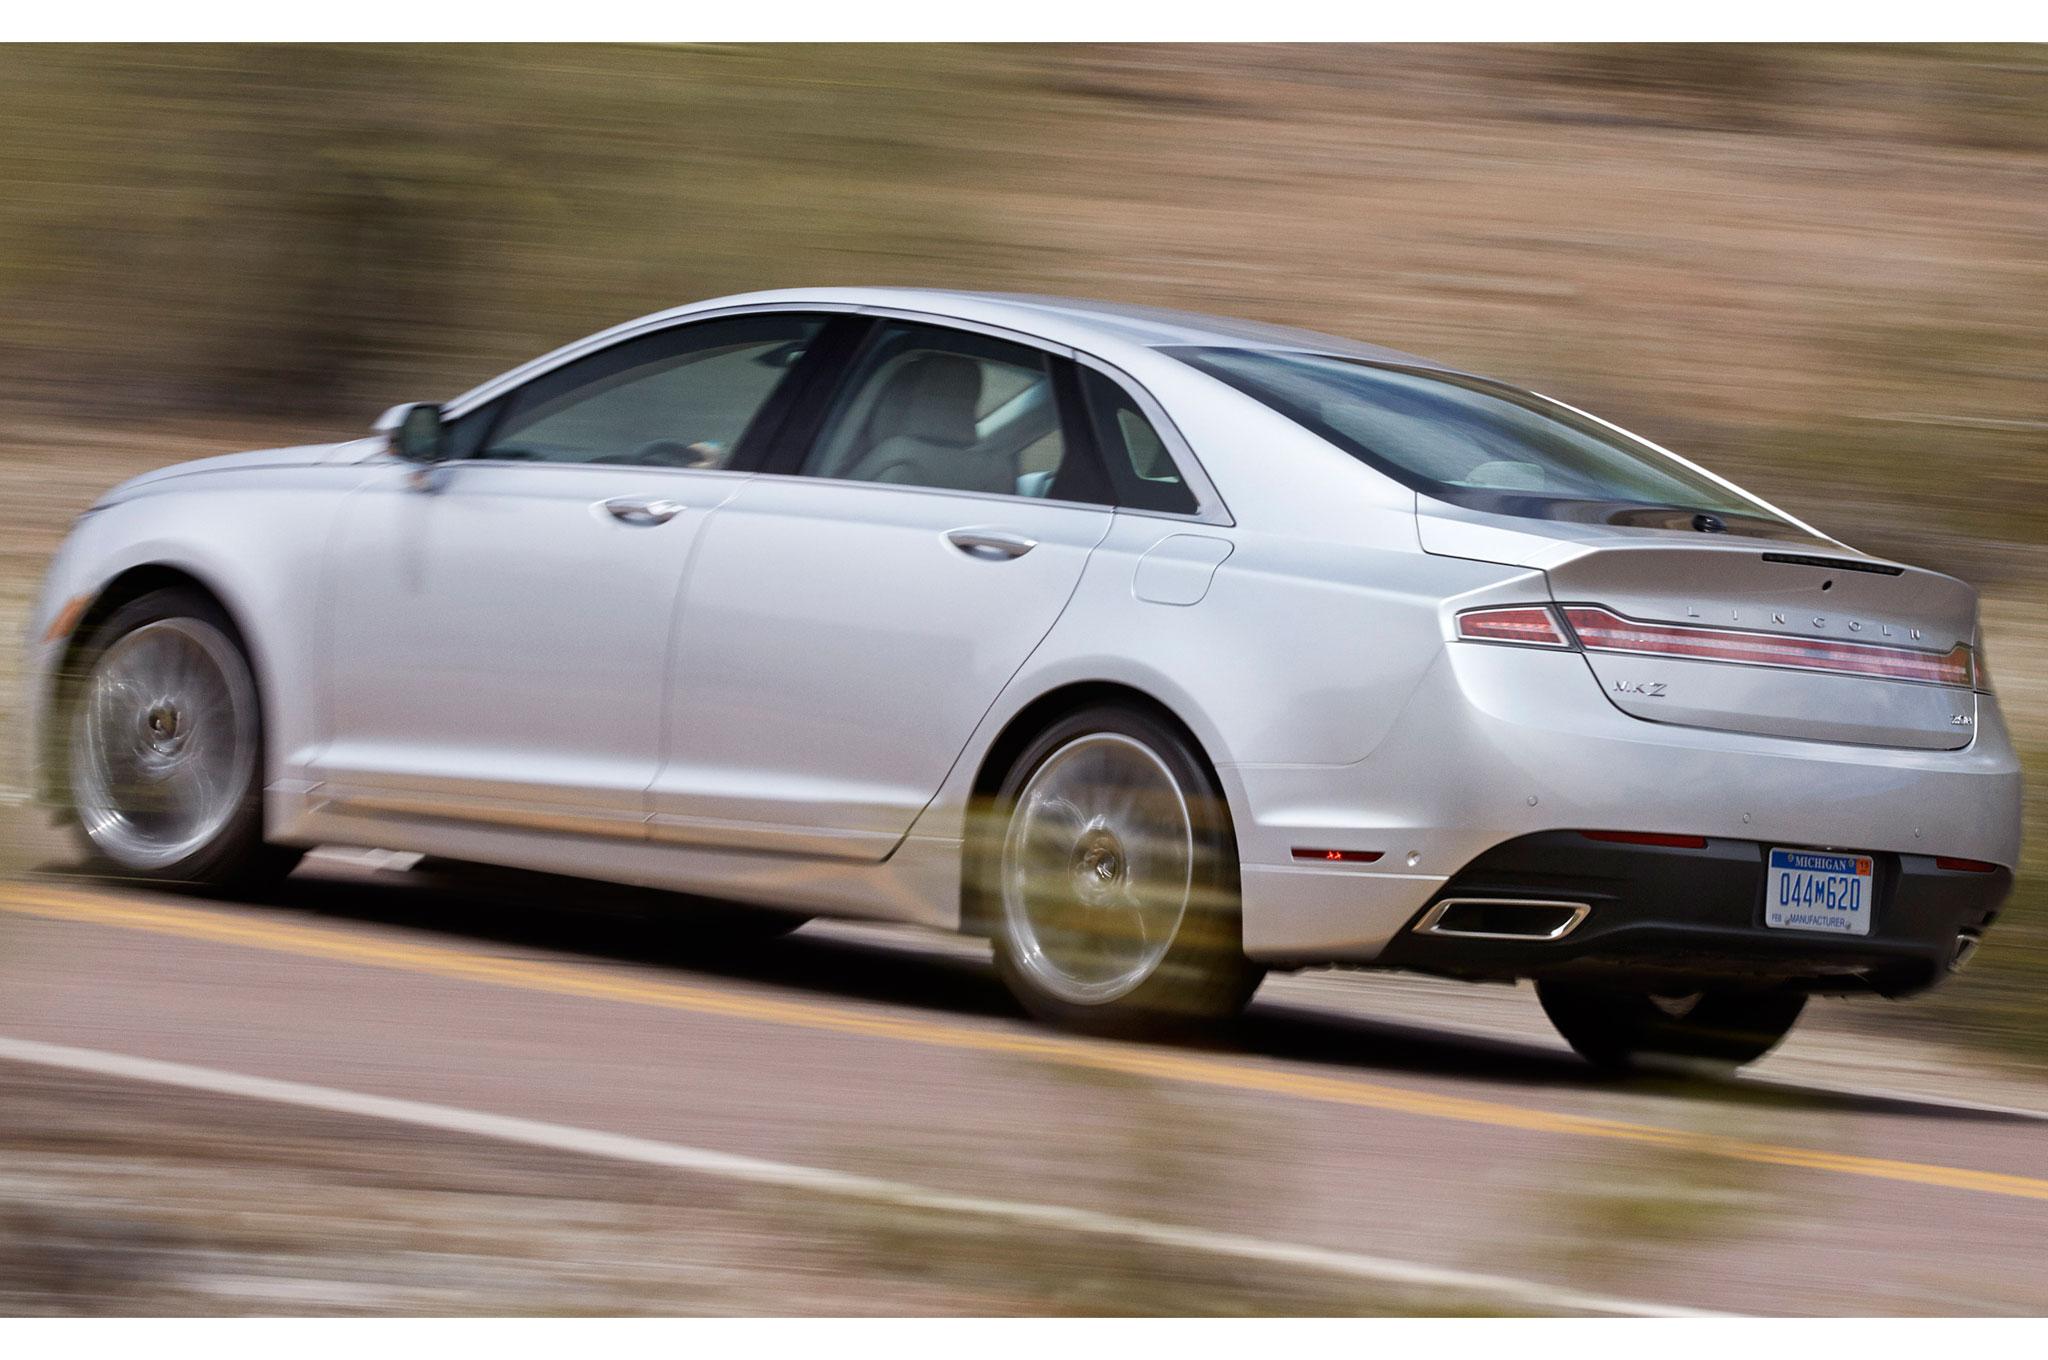 2017 Lincoln Mkz Hybrid 25 142